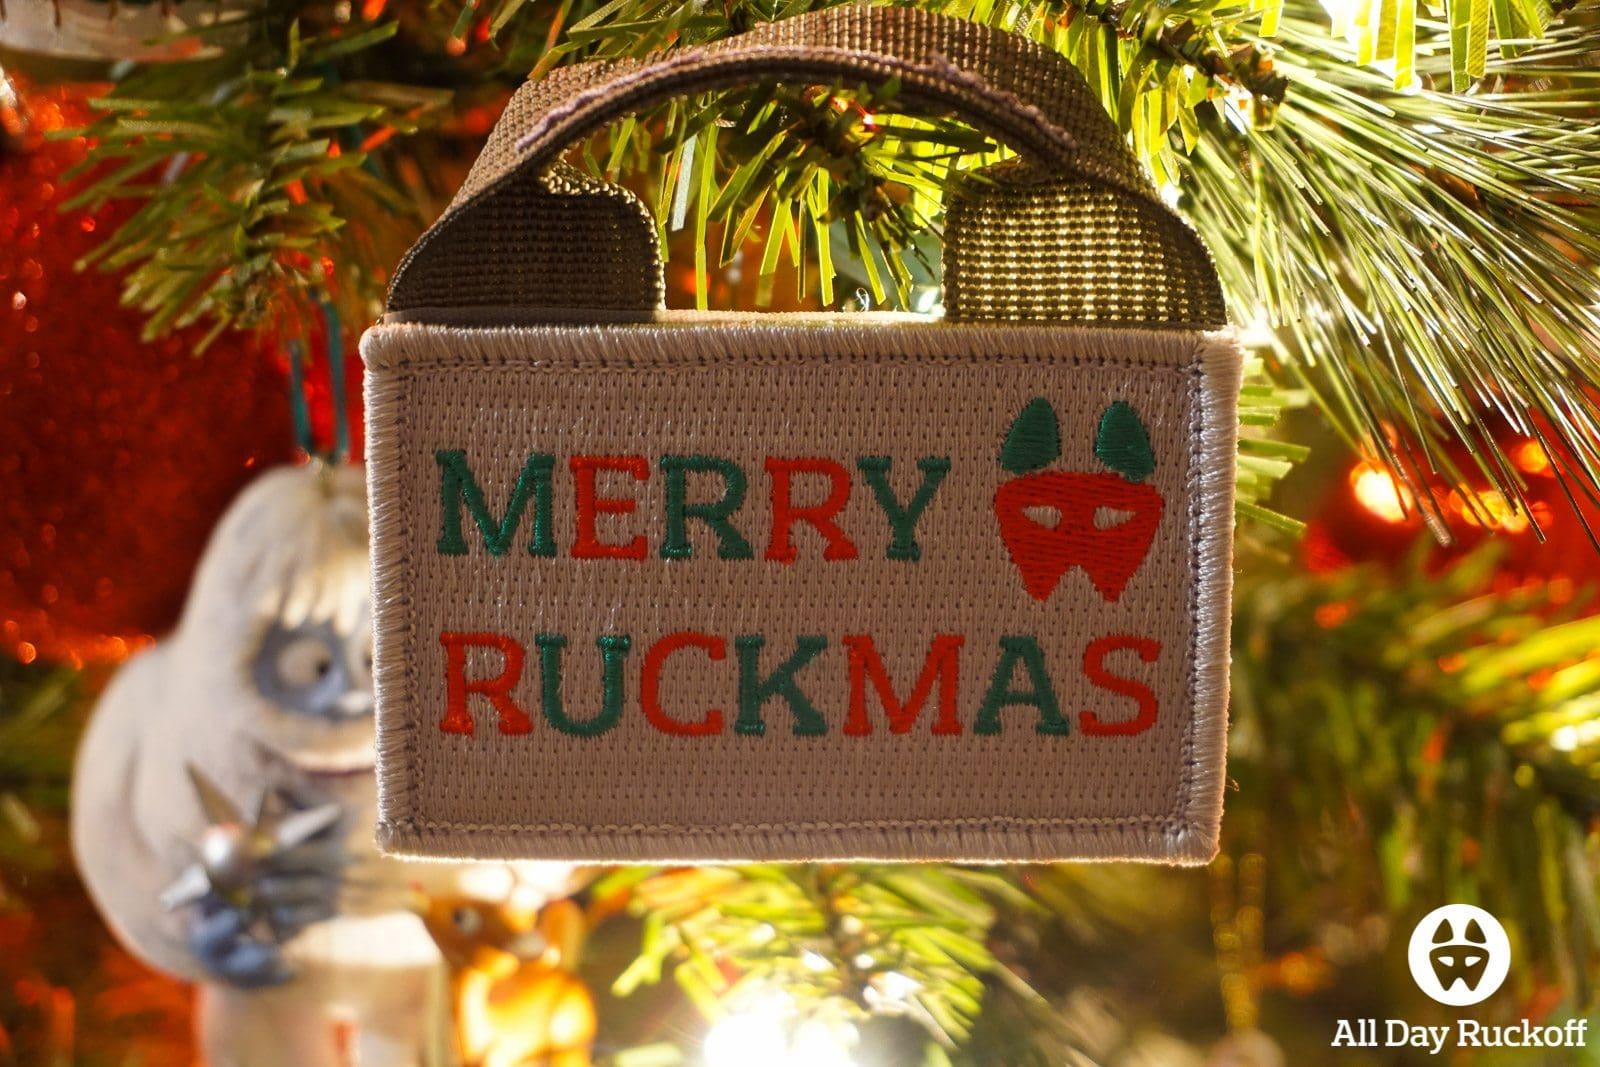 Merry Ruckmas 02